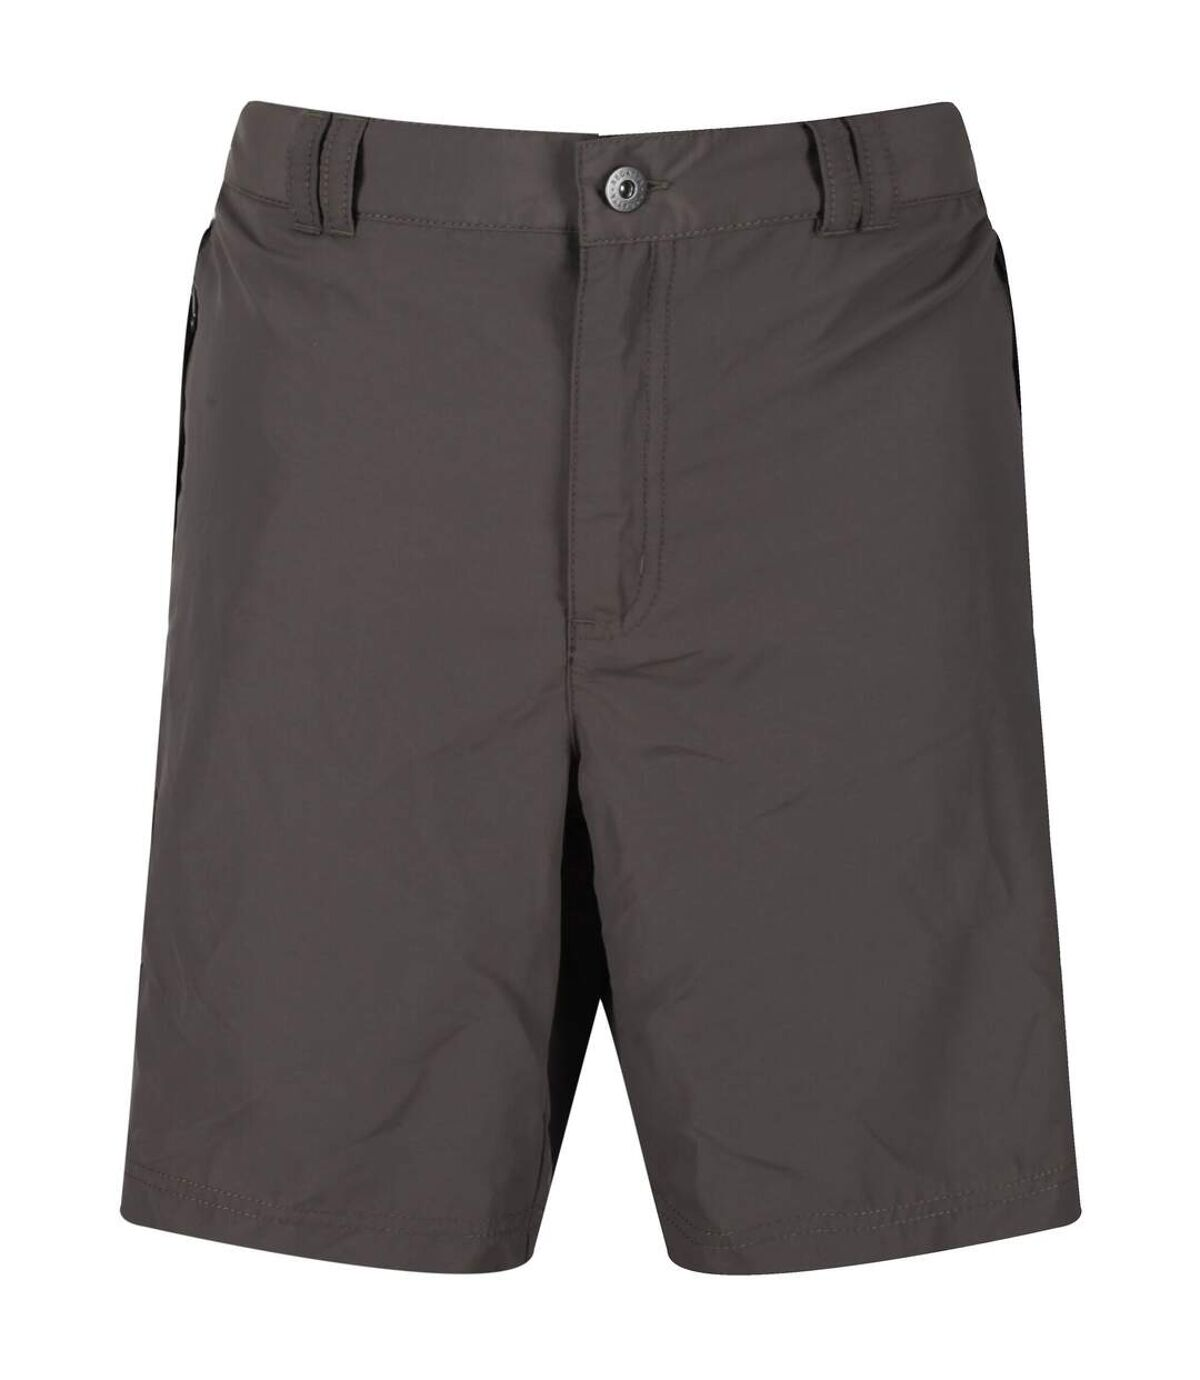 Regatta Mens Leesville II Walking Shorts (Hawthorn) - UTRG4934